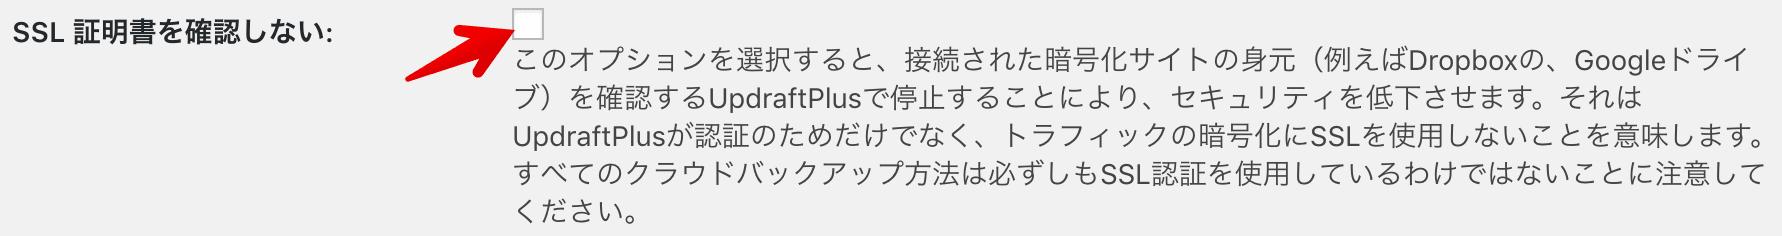 UpdraftPlus-Backup/Restore-SSL証明書を確認しない